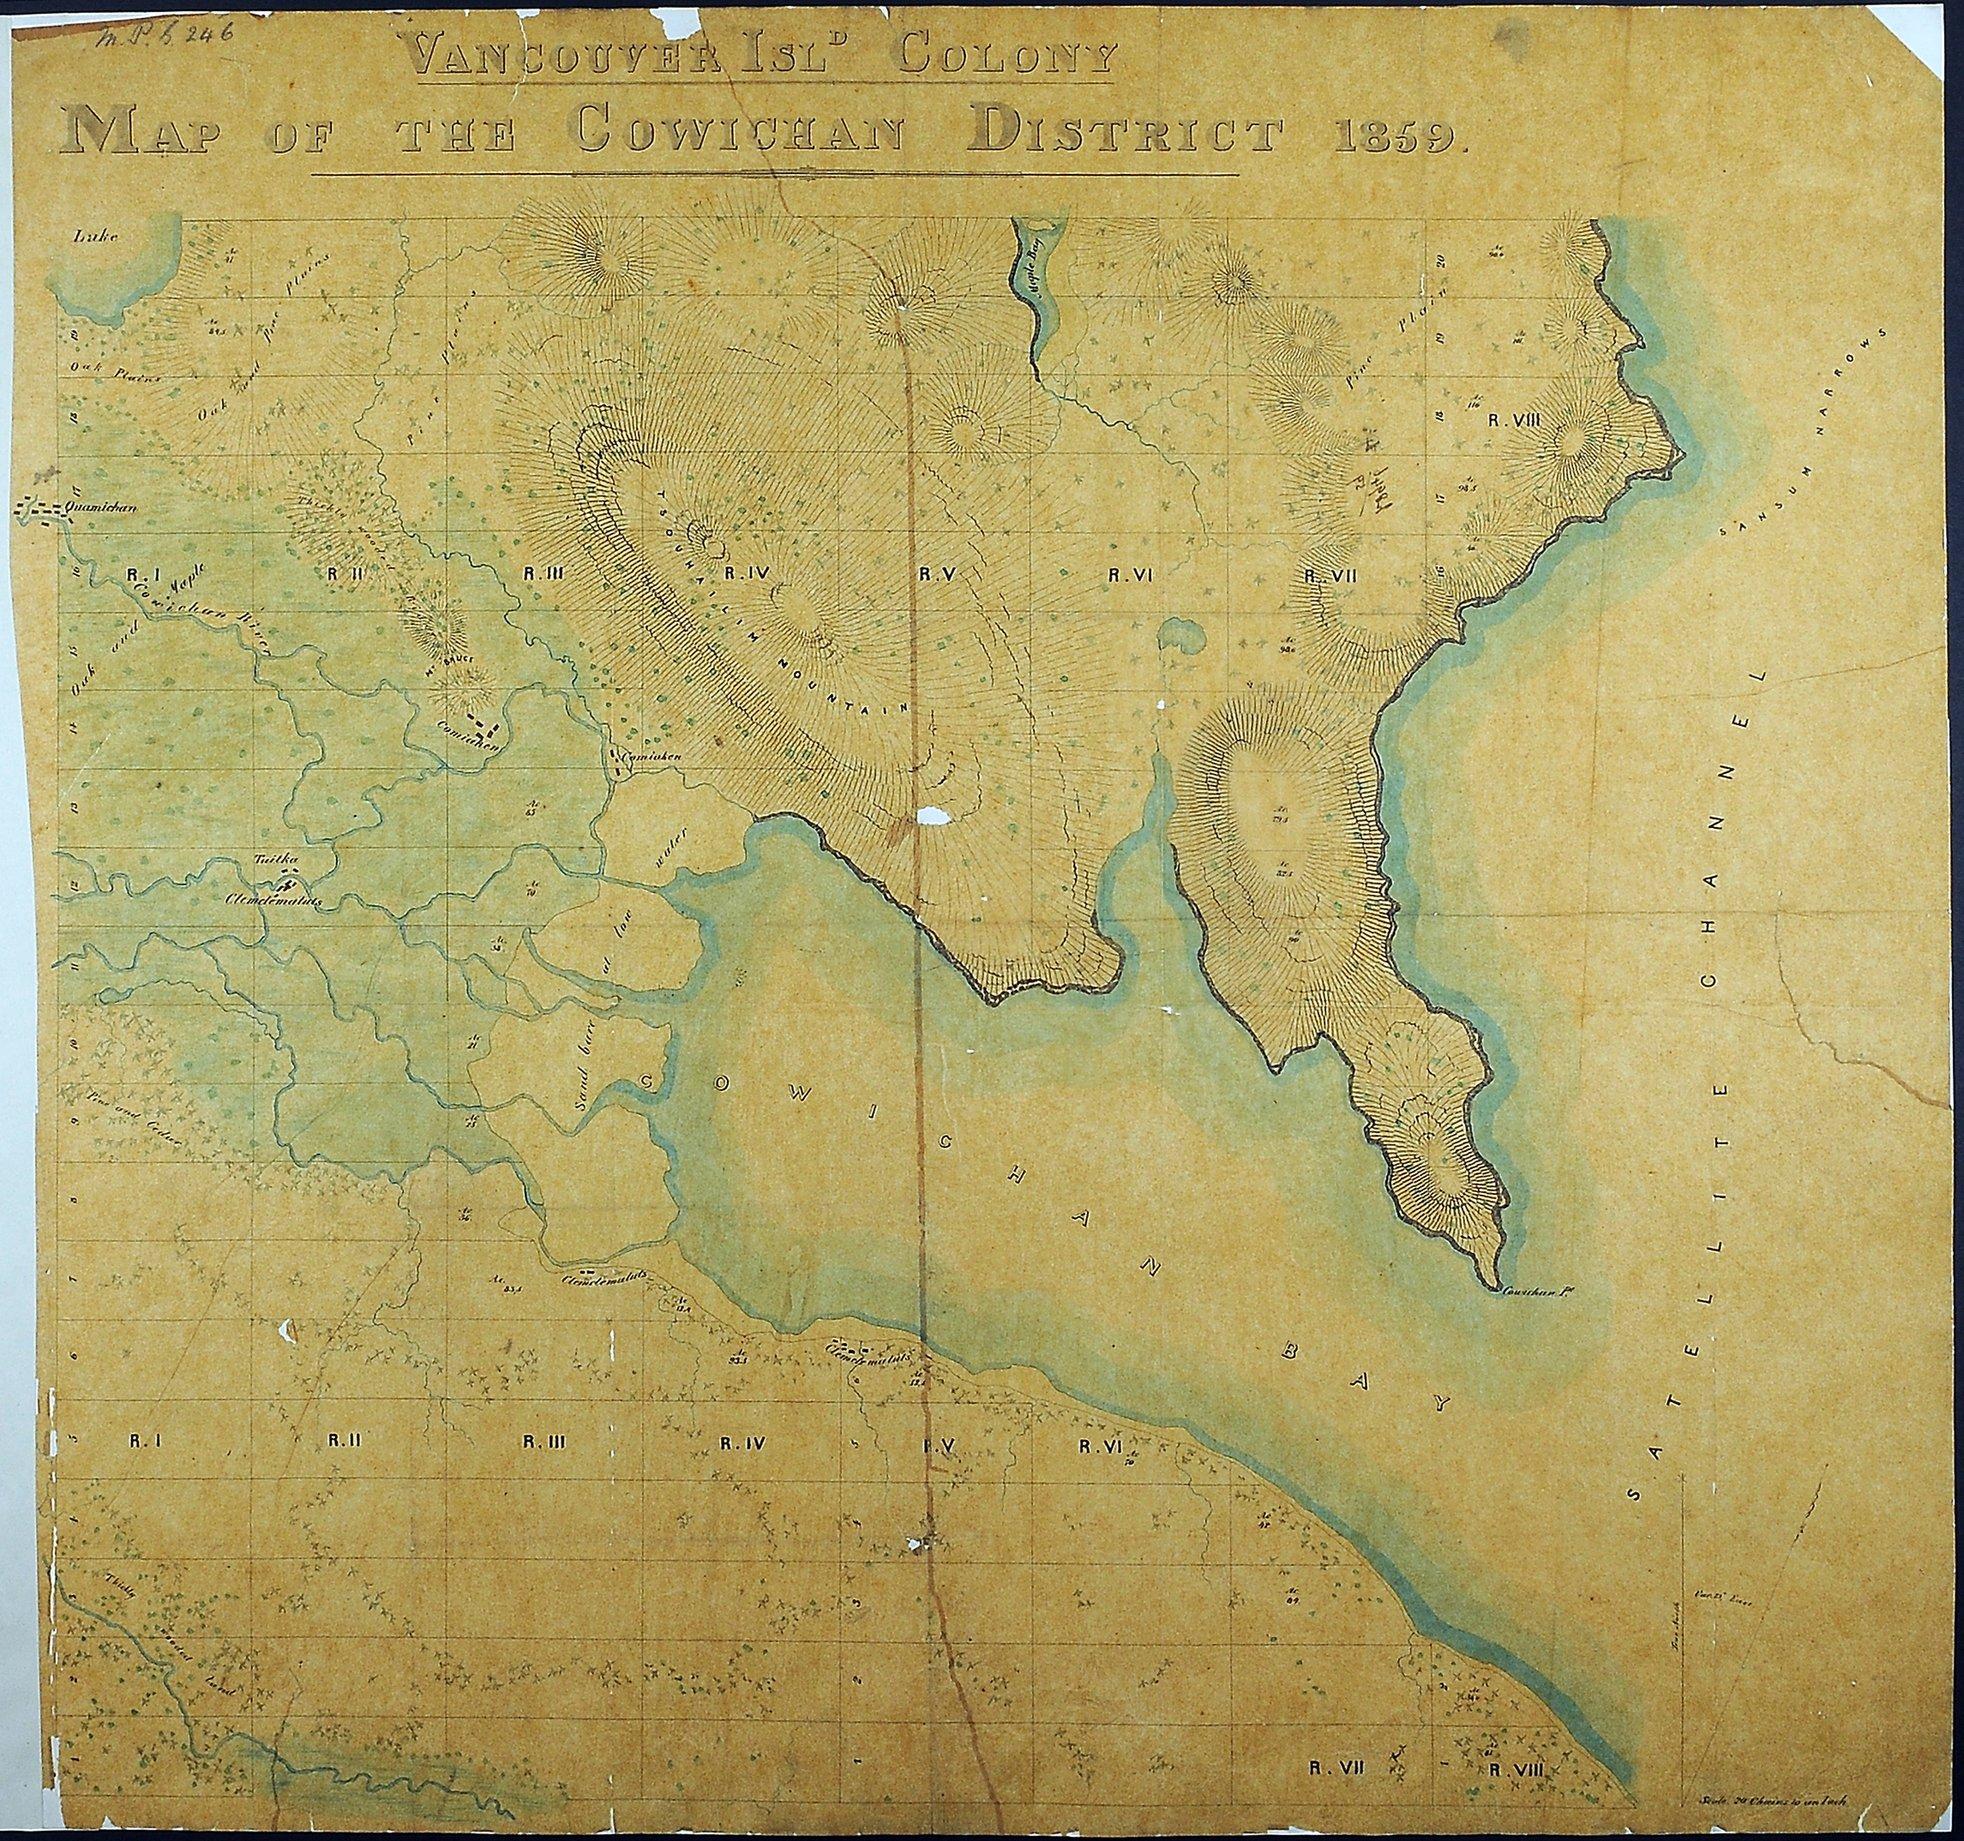 Cowichan District, 1859.